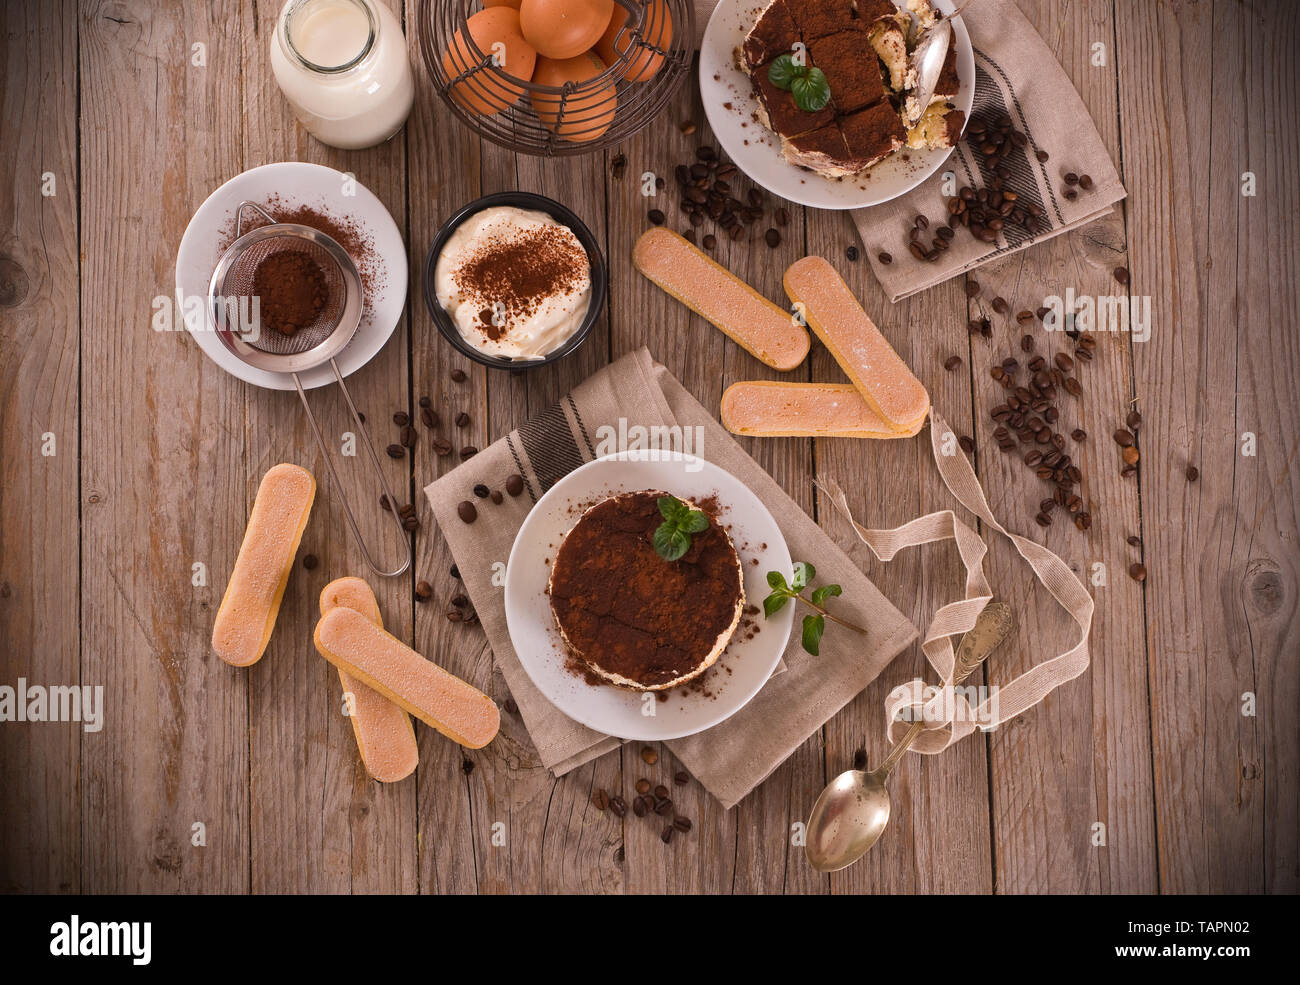 Tiramisu. - Stock Image